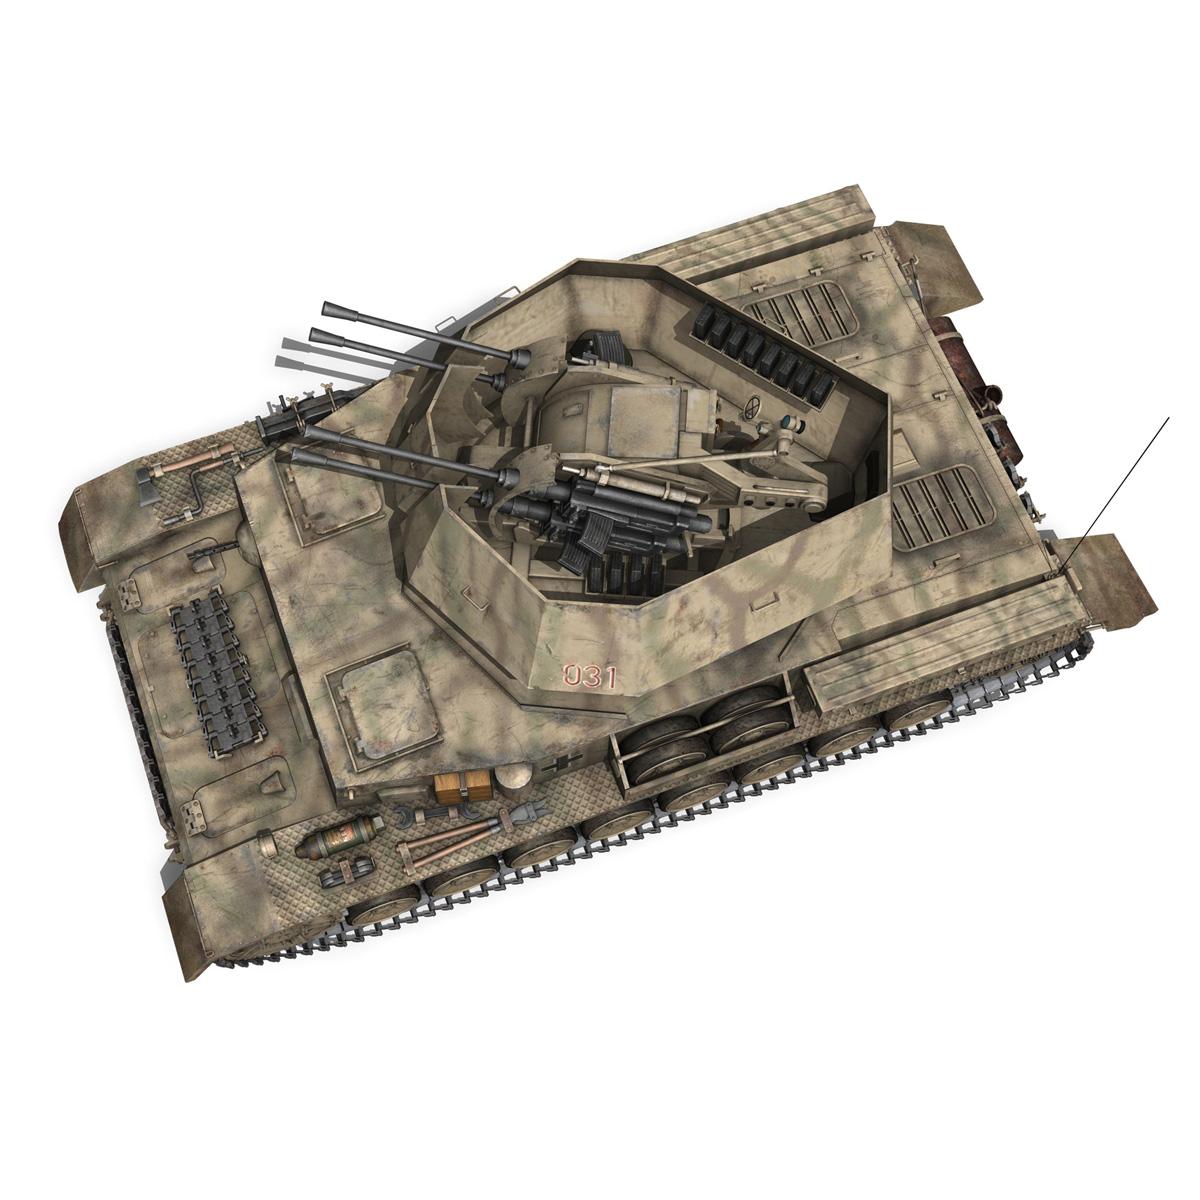 flakpanzer iv – wirbelwind 3d model 3ds fbx c4d lwo obj 191504